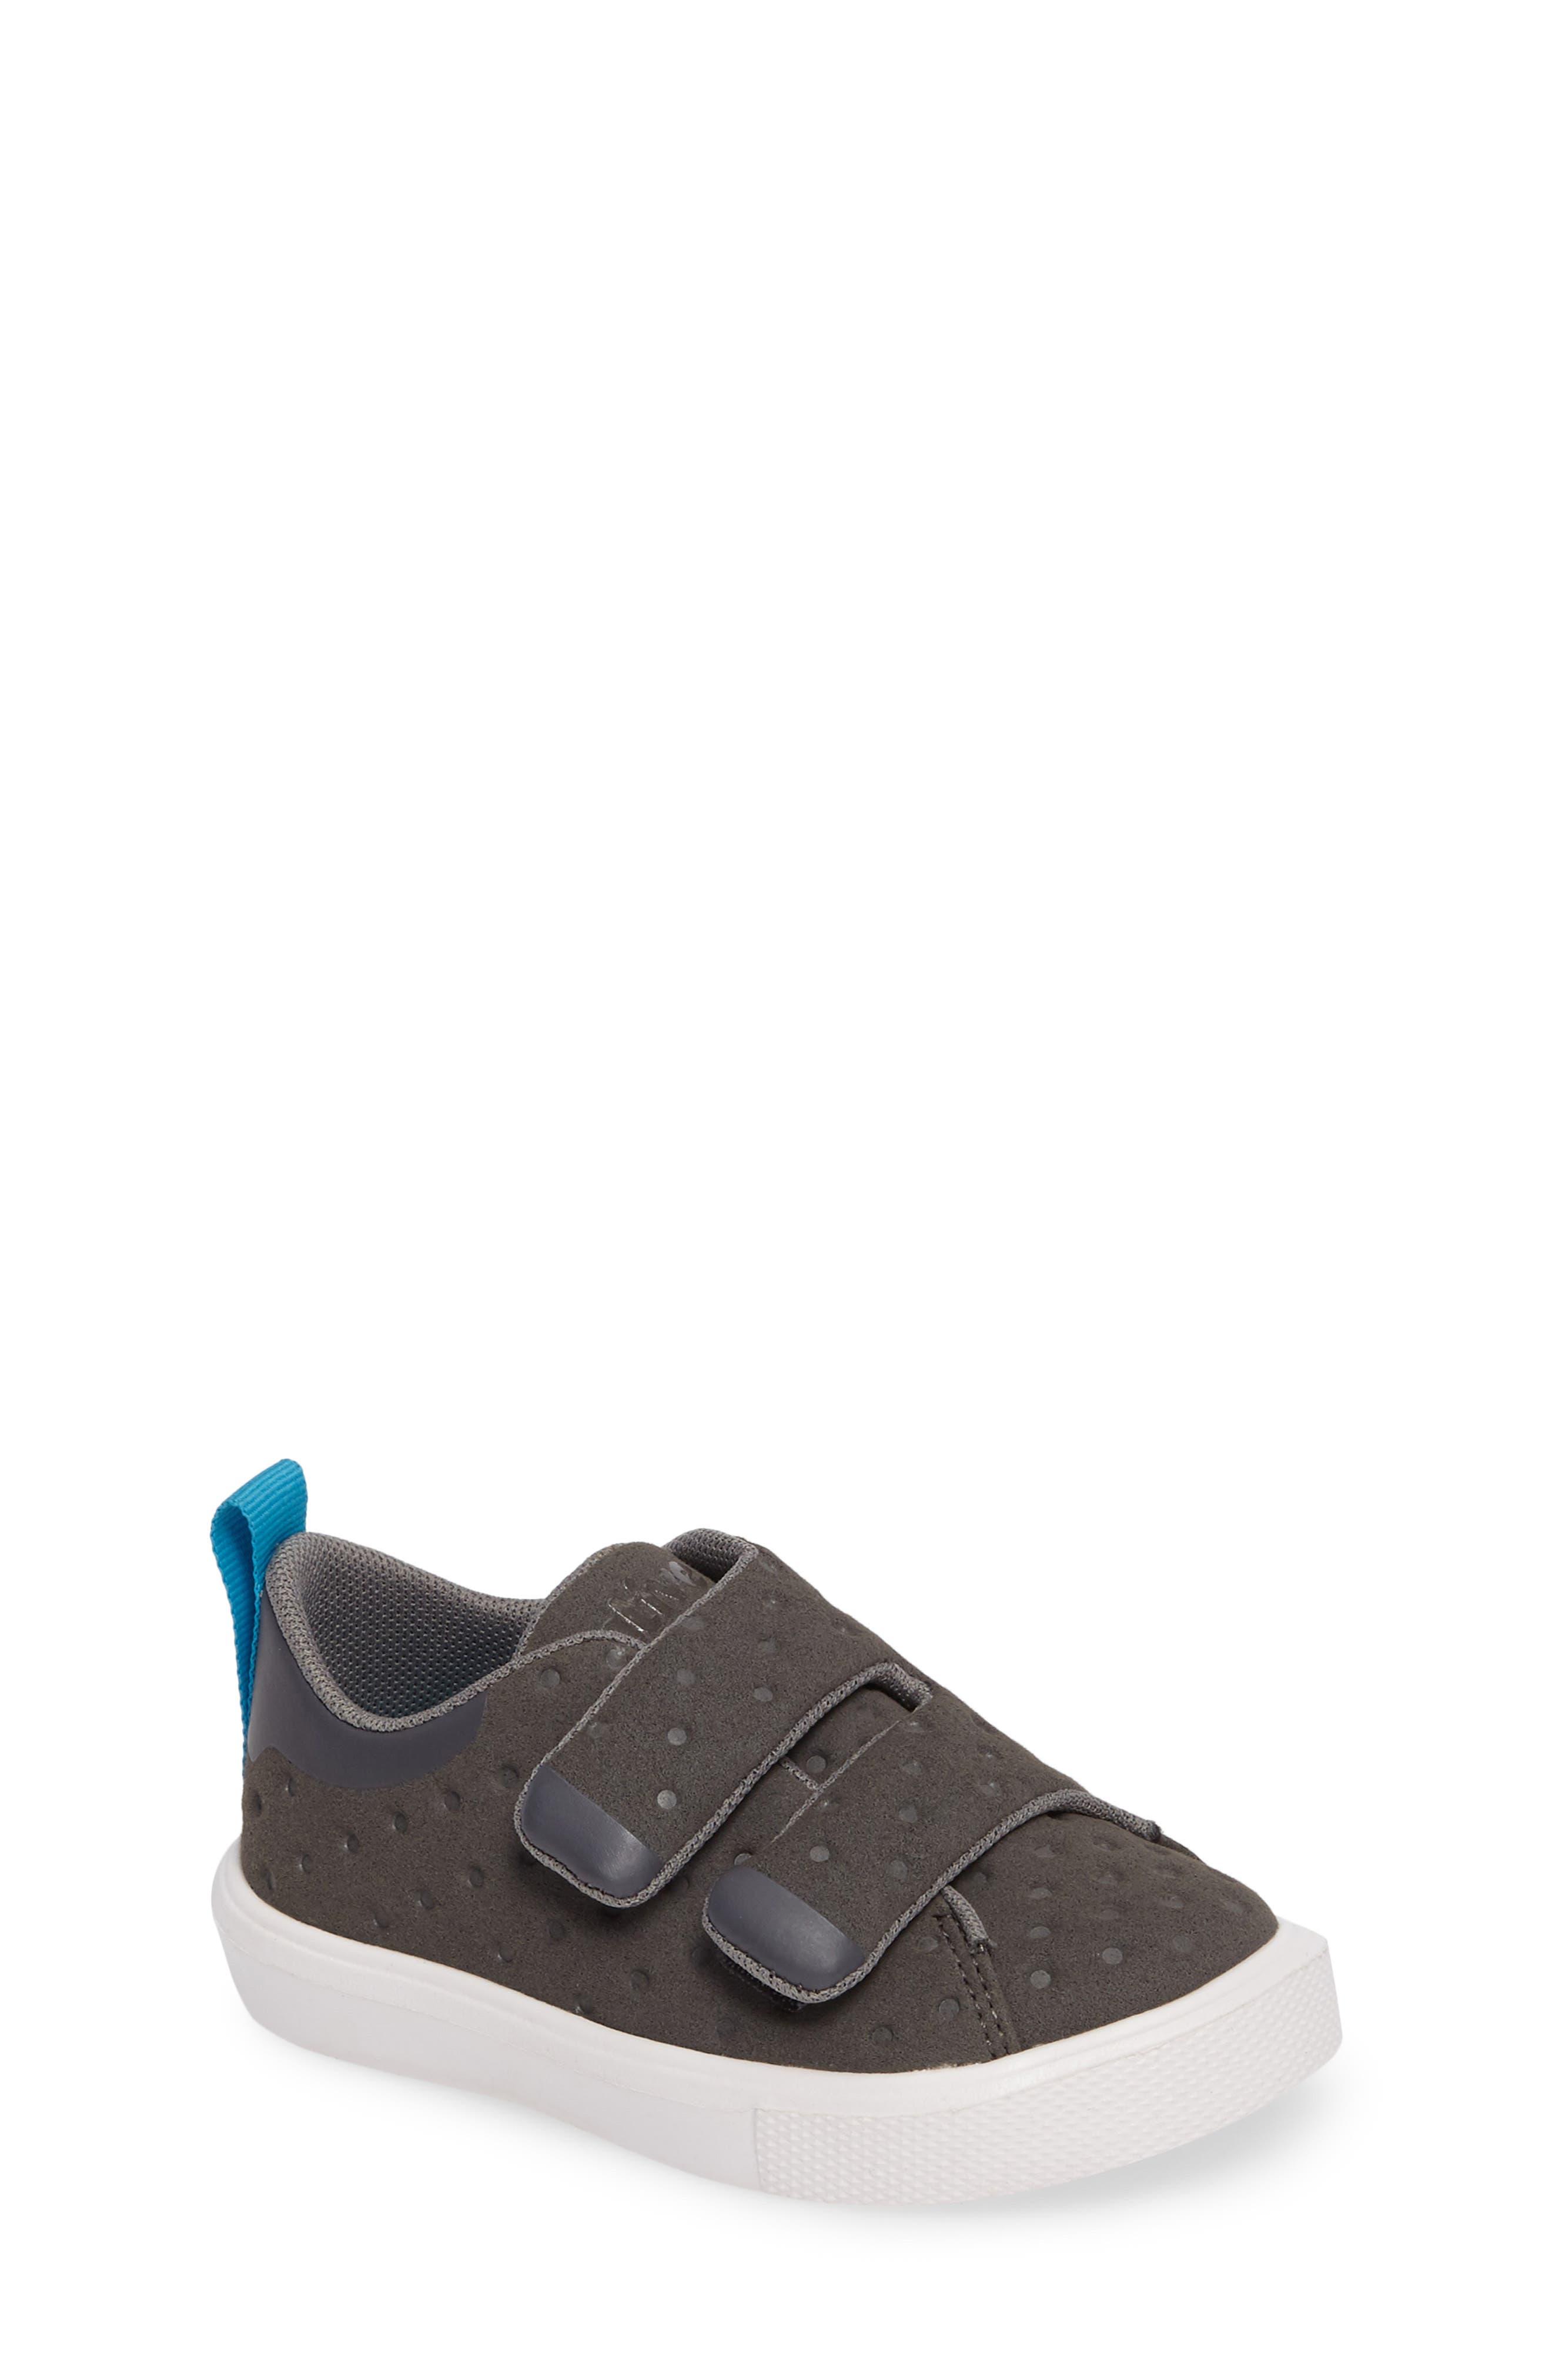 Monaco Sneaker,                             Main thumbnail 1, color,                             Dublin Grey/ Shell White